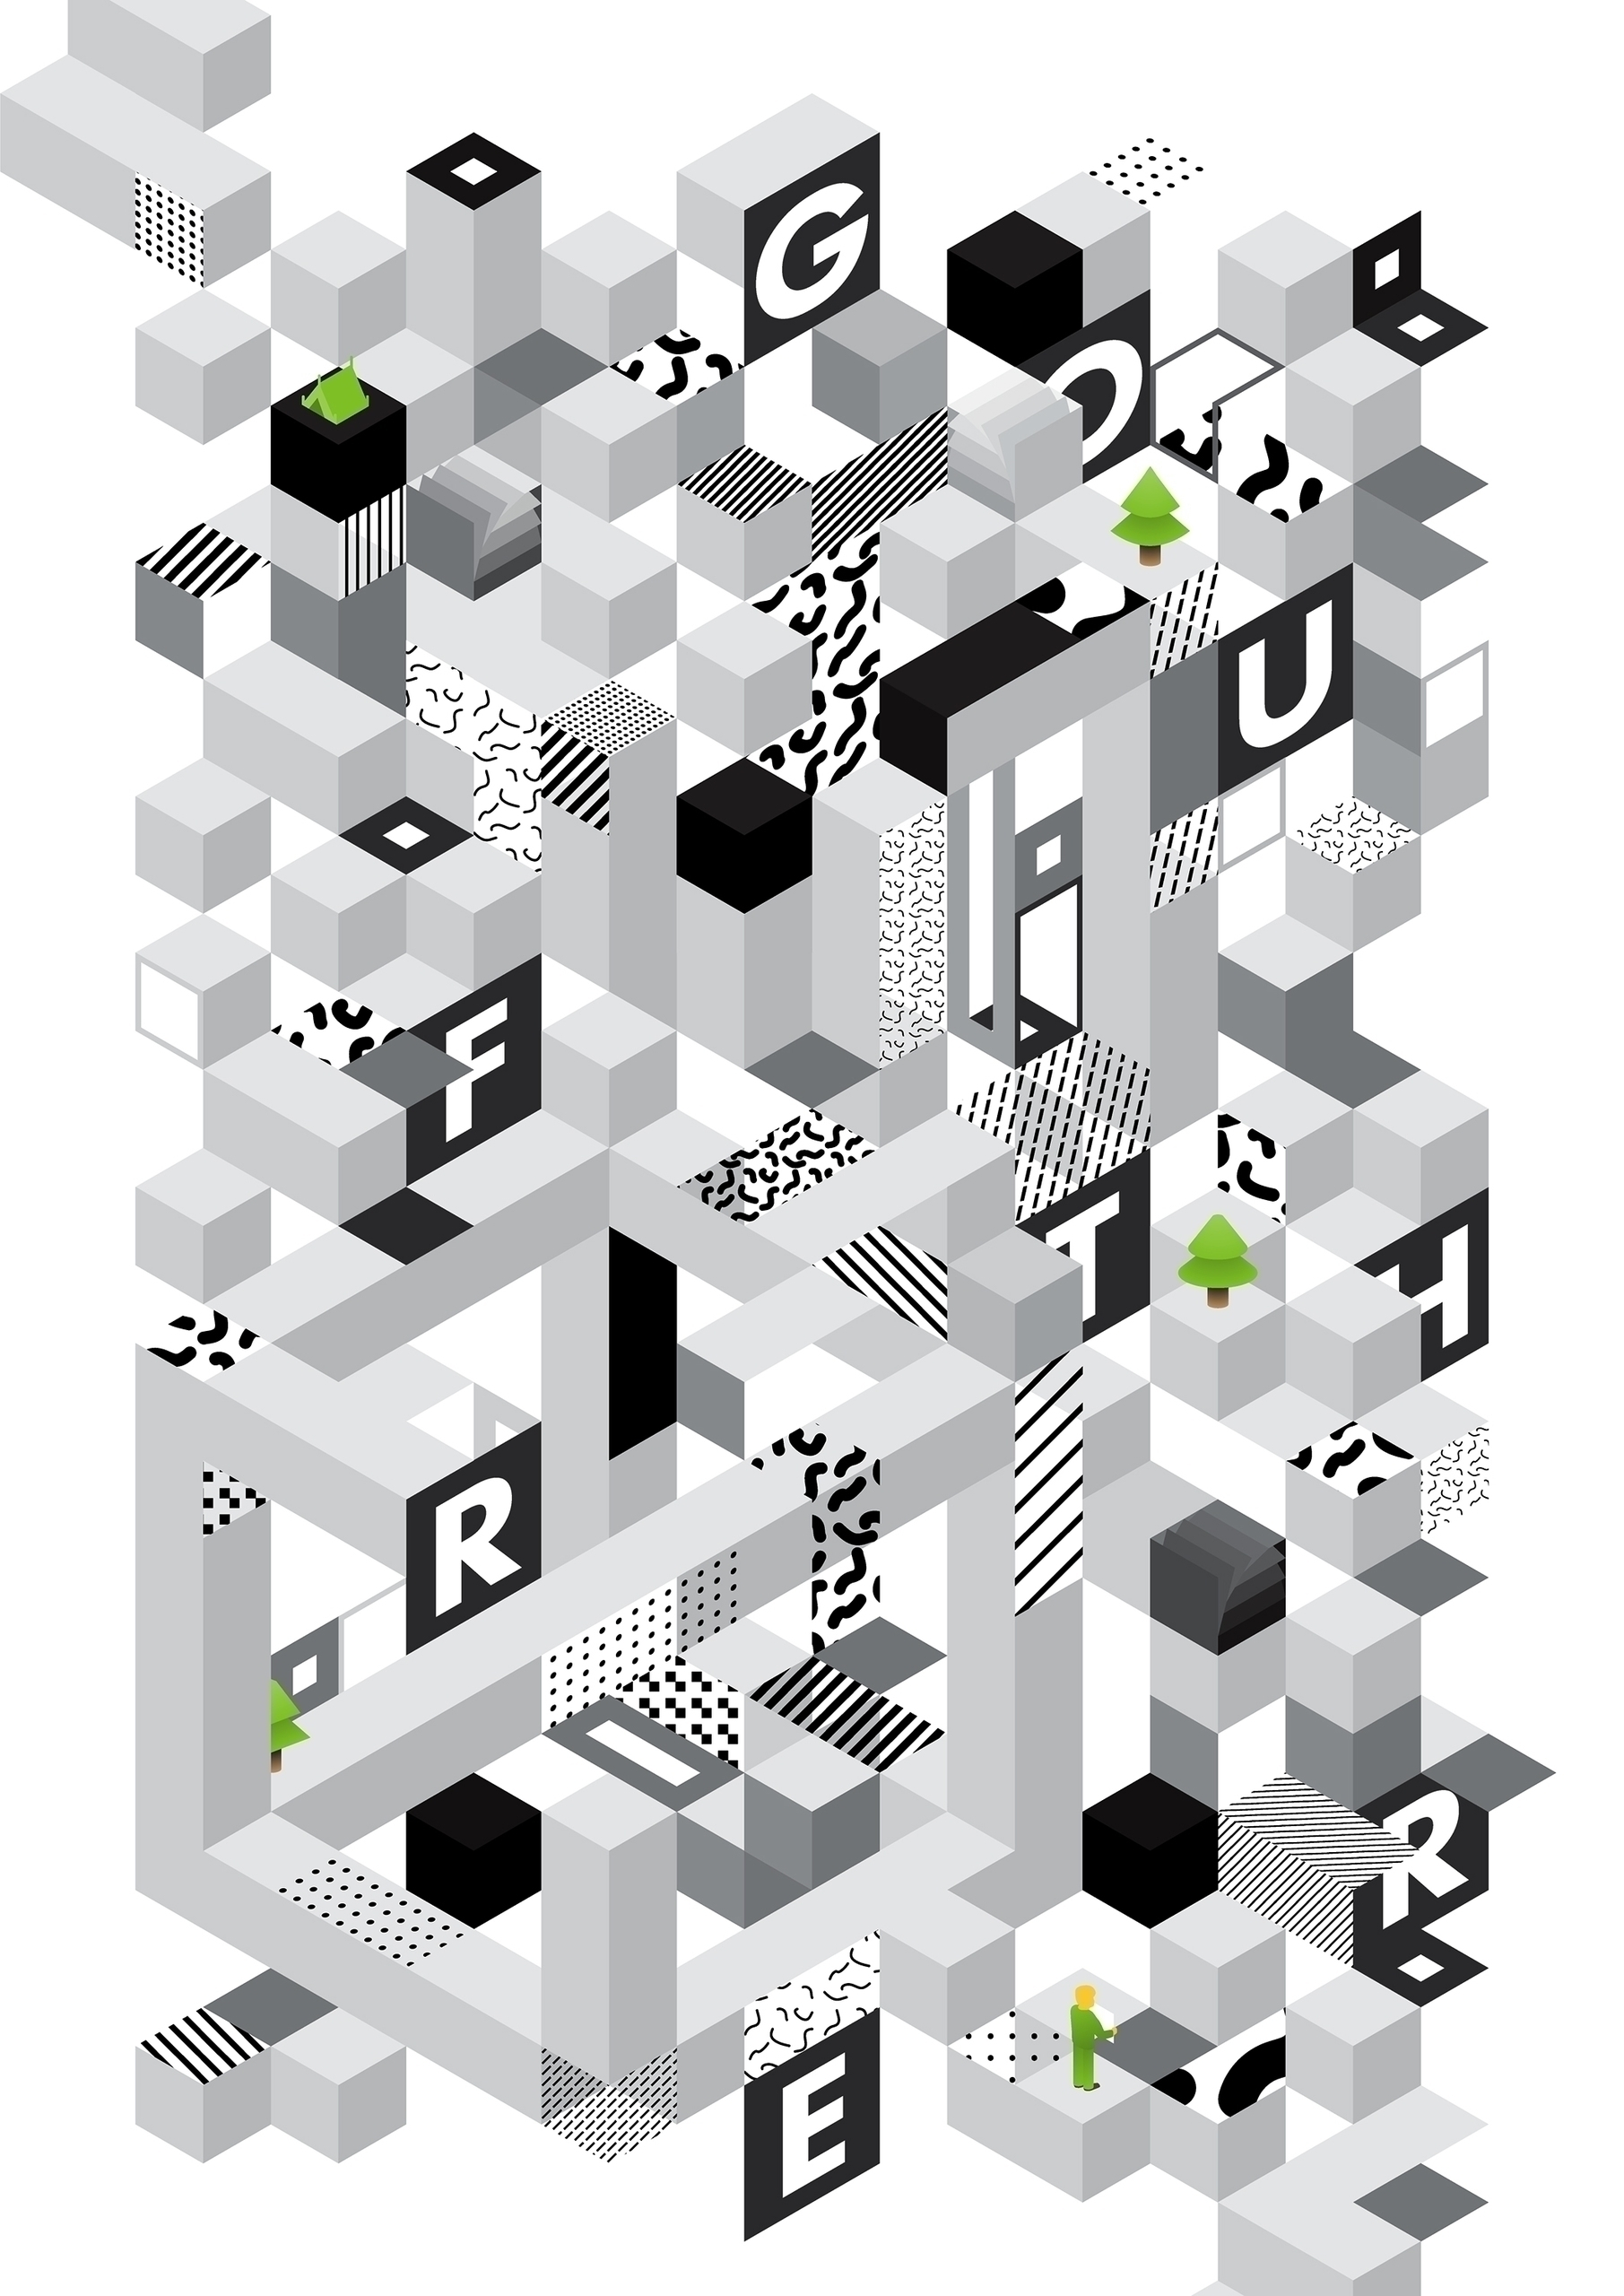 bit thought posters. idea proce - theradya | ello